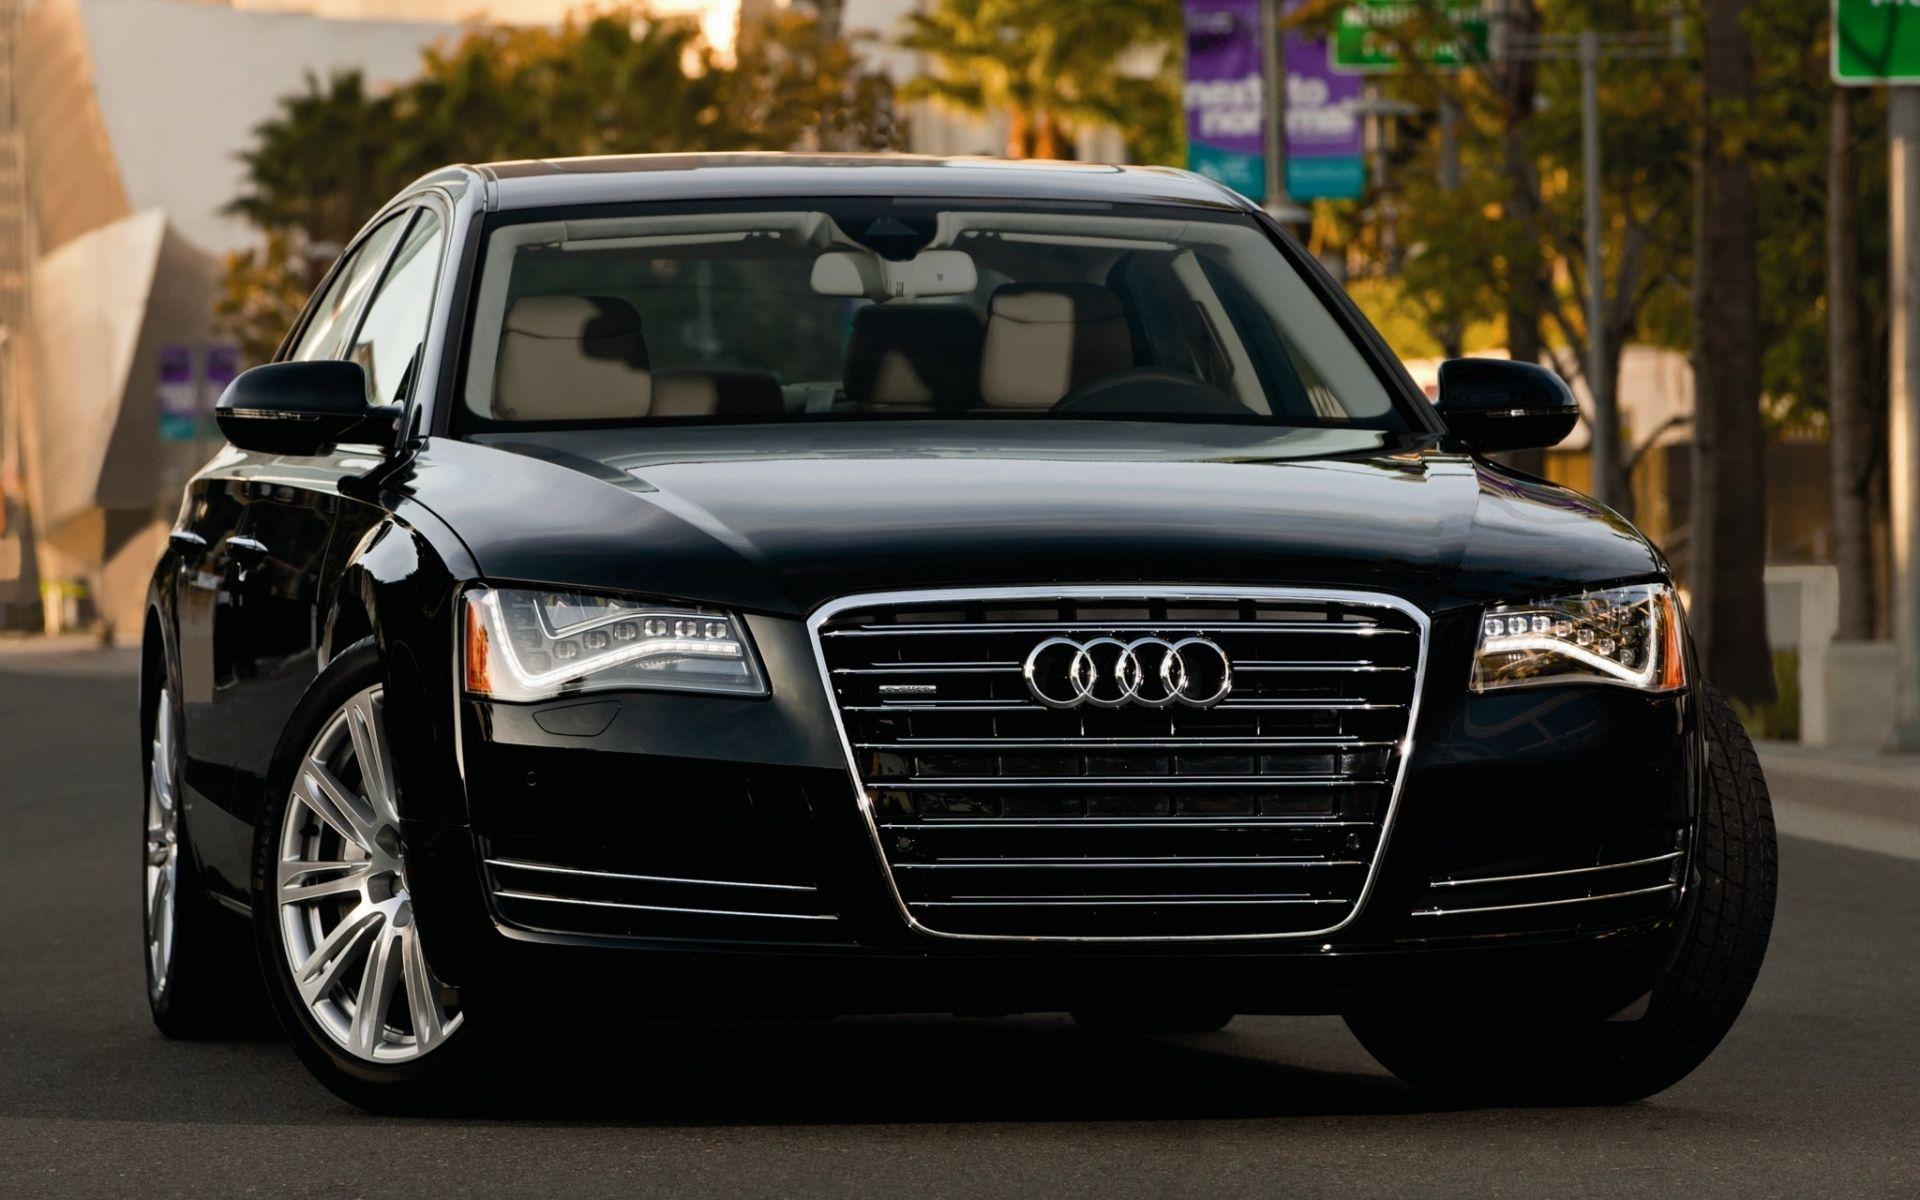 2014 Audi A8 Sedan Wallpapers Audi A8 Audi Cars Bmw